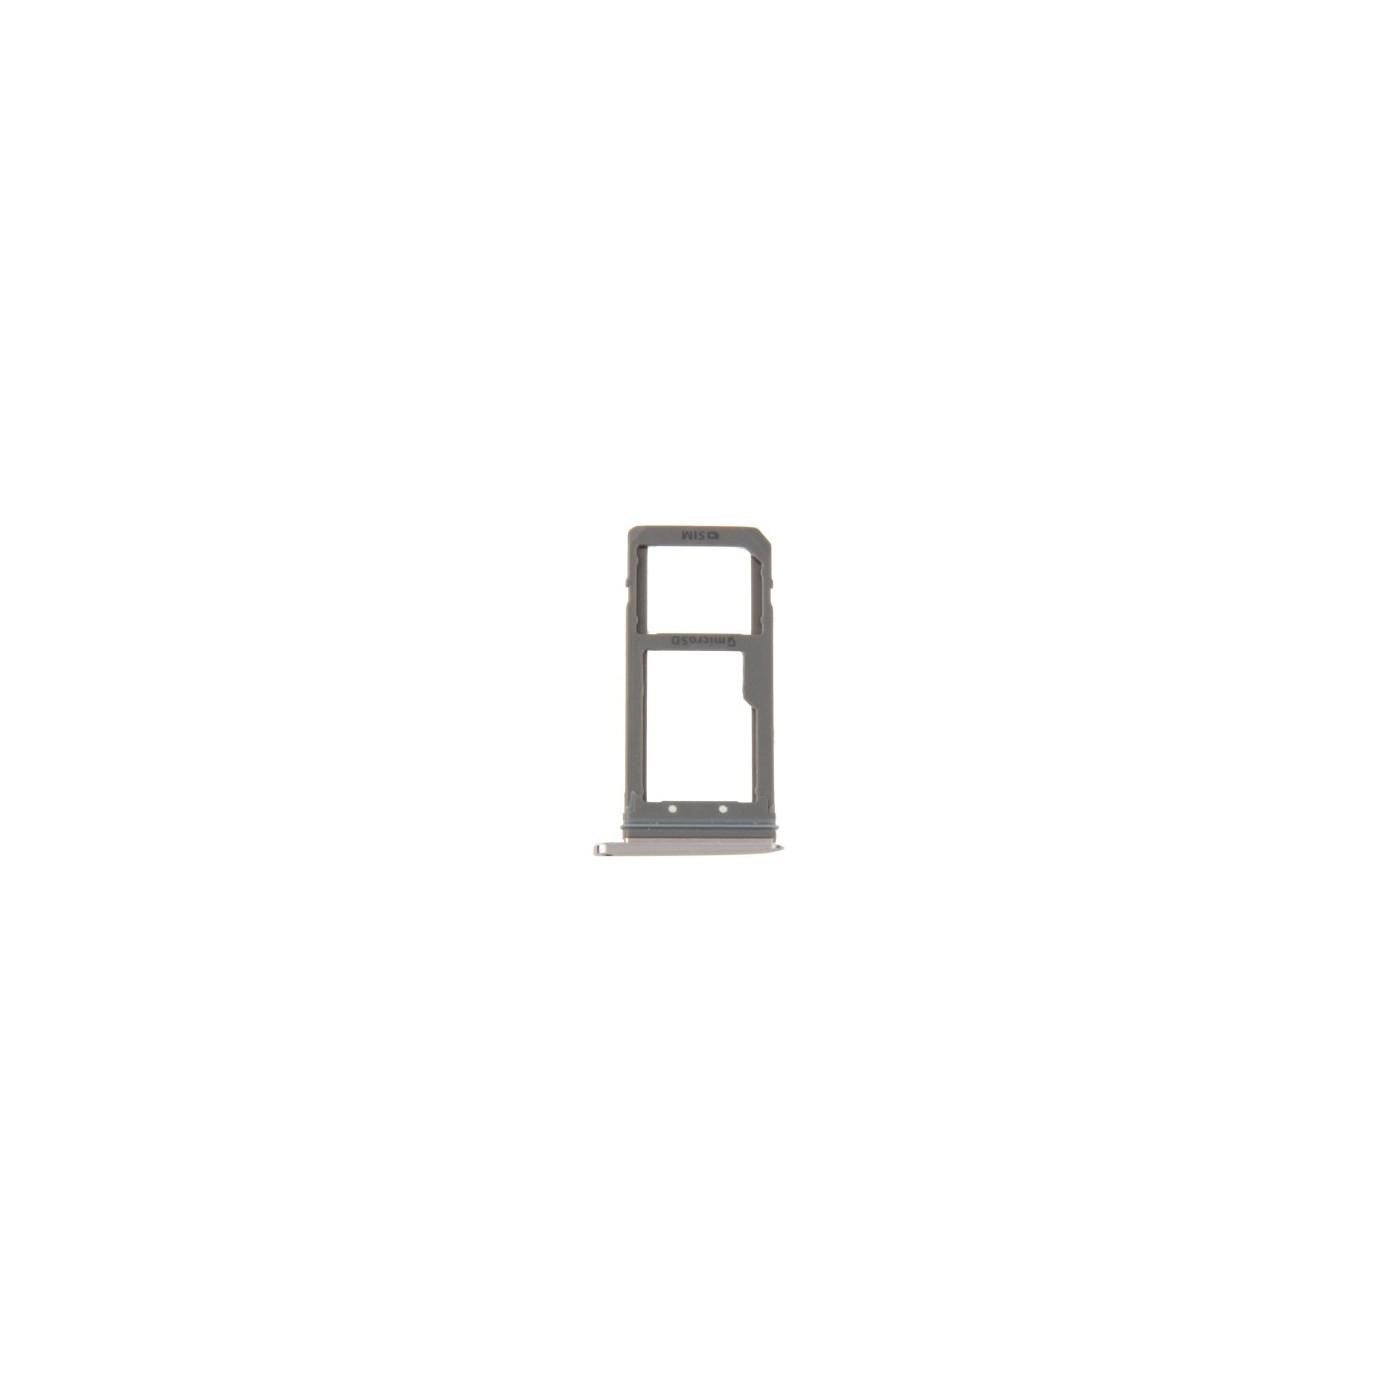 Portatarjetas Micro SD Rose Gold Samsung Galaxy S7 Edge / G935F reemplazo